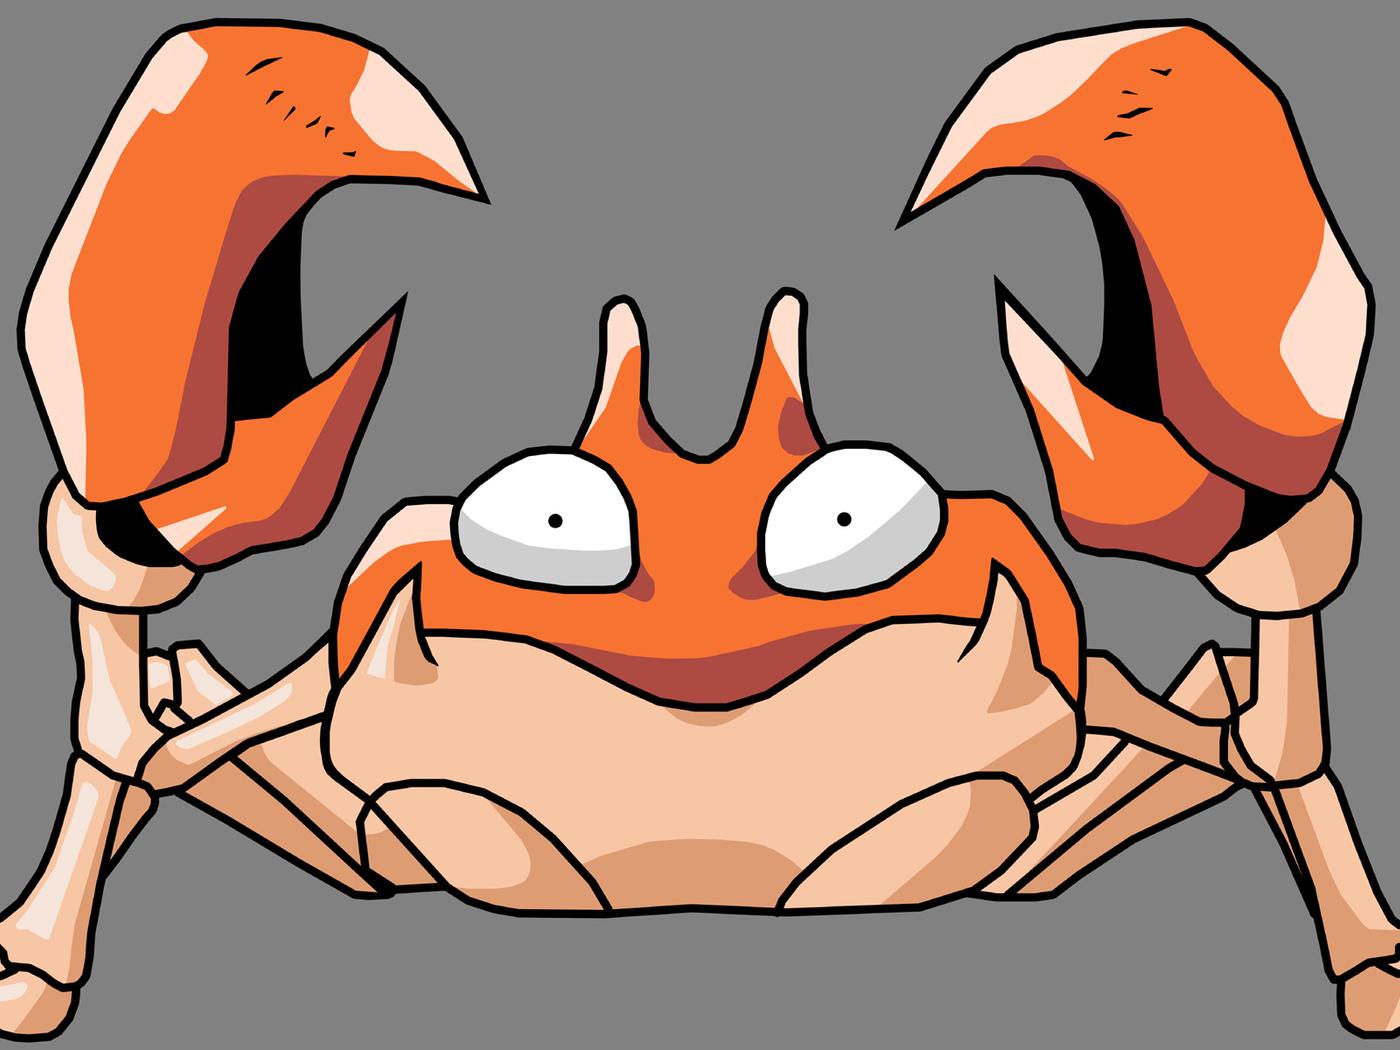 krabby, pokemon